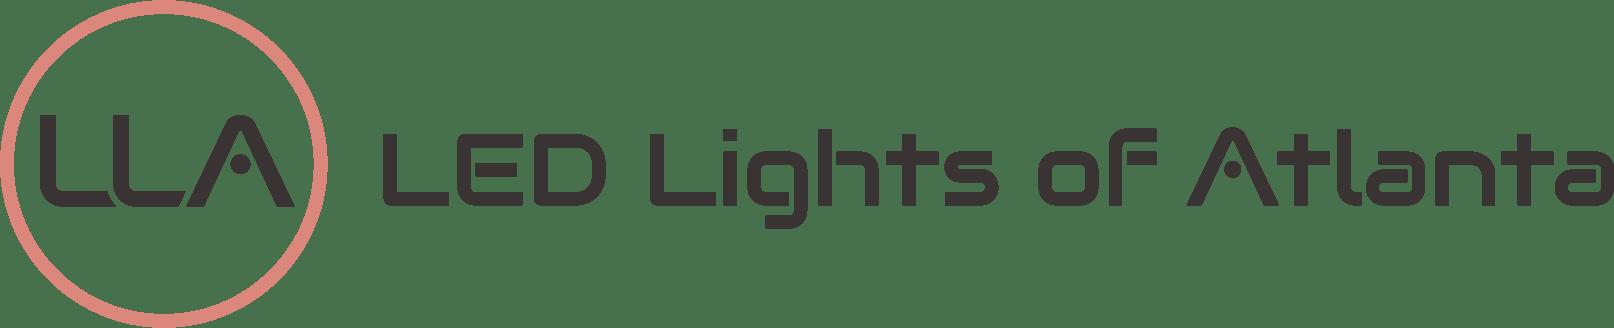 CX-22612_LED Lights of Atlanta